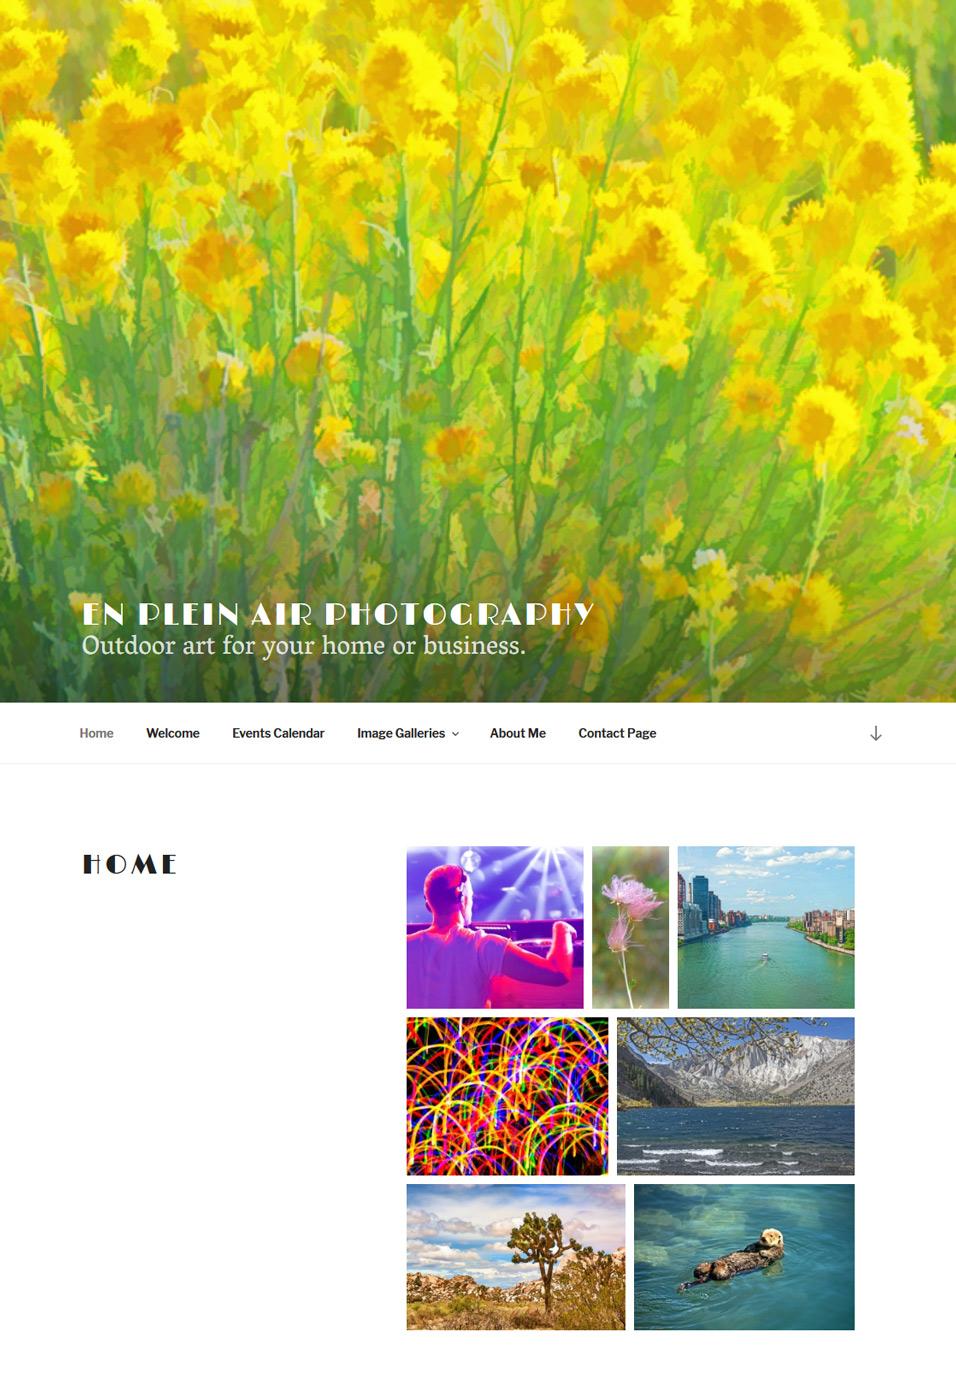 enpleinairphotography.com homepage